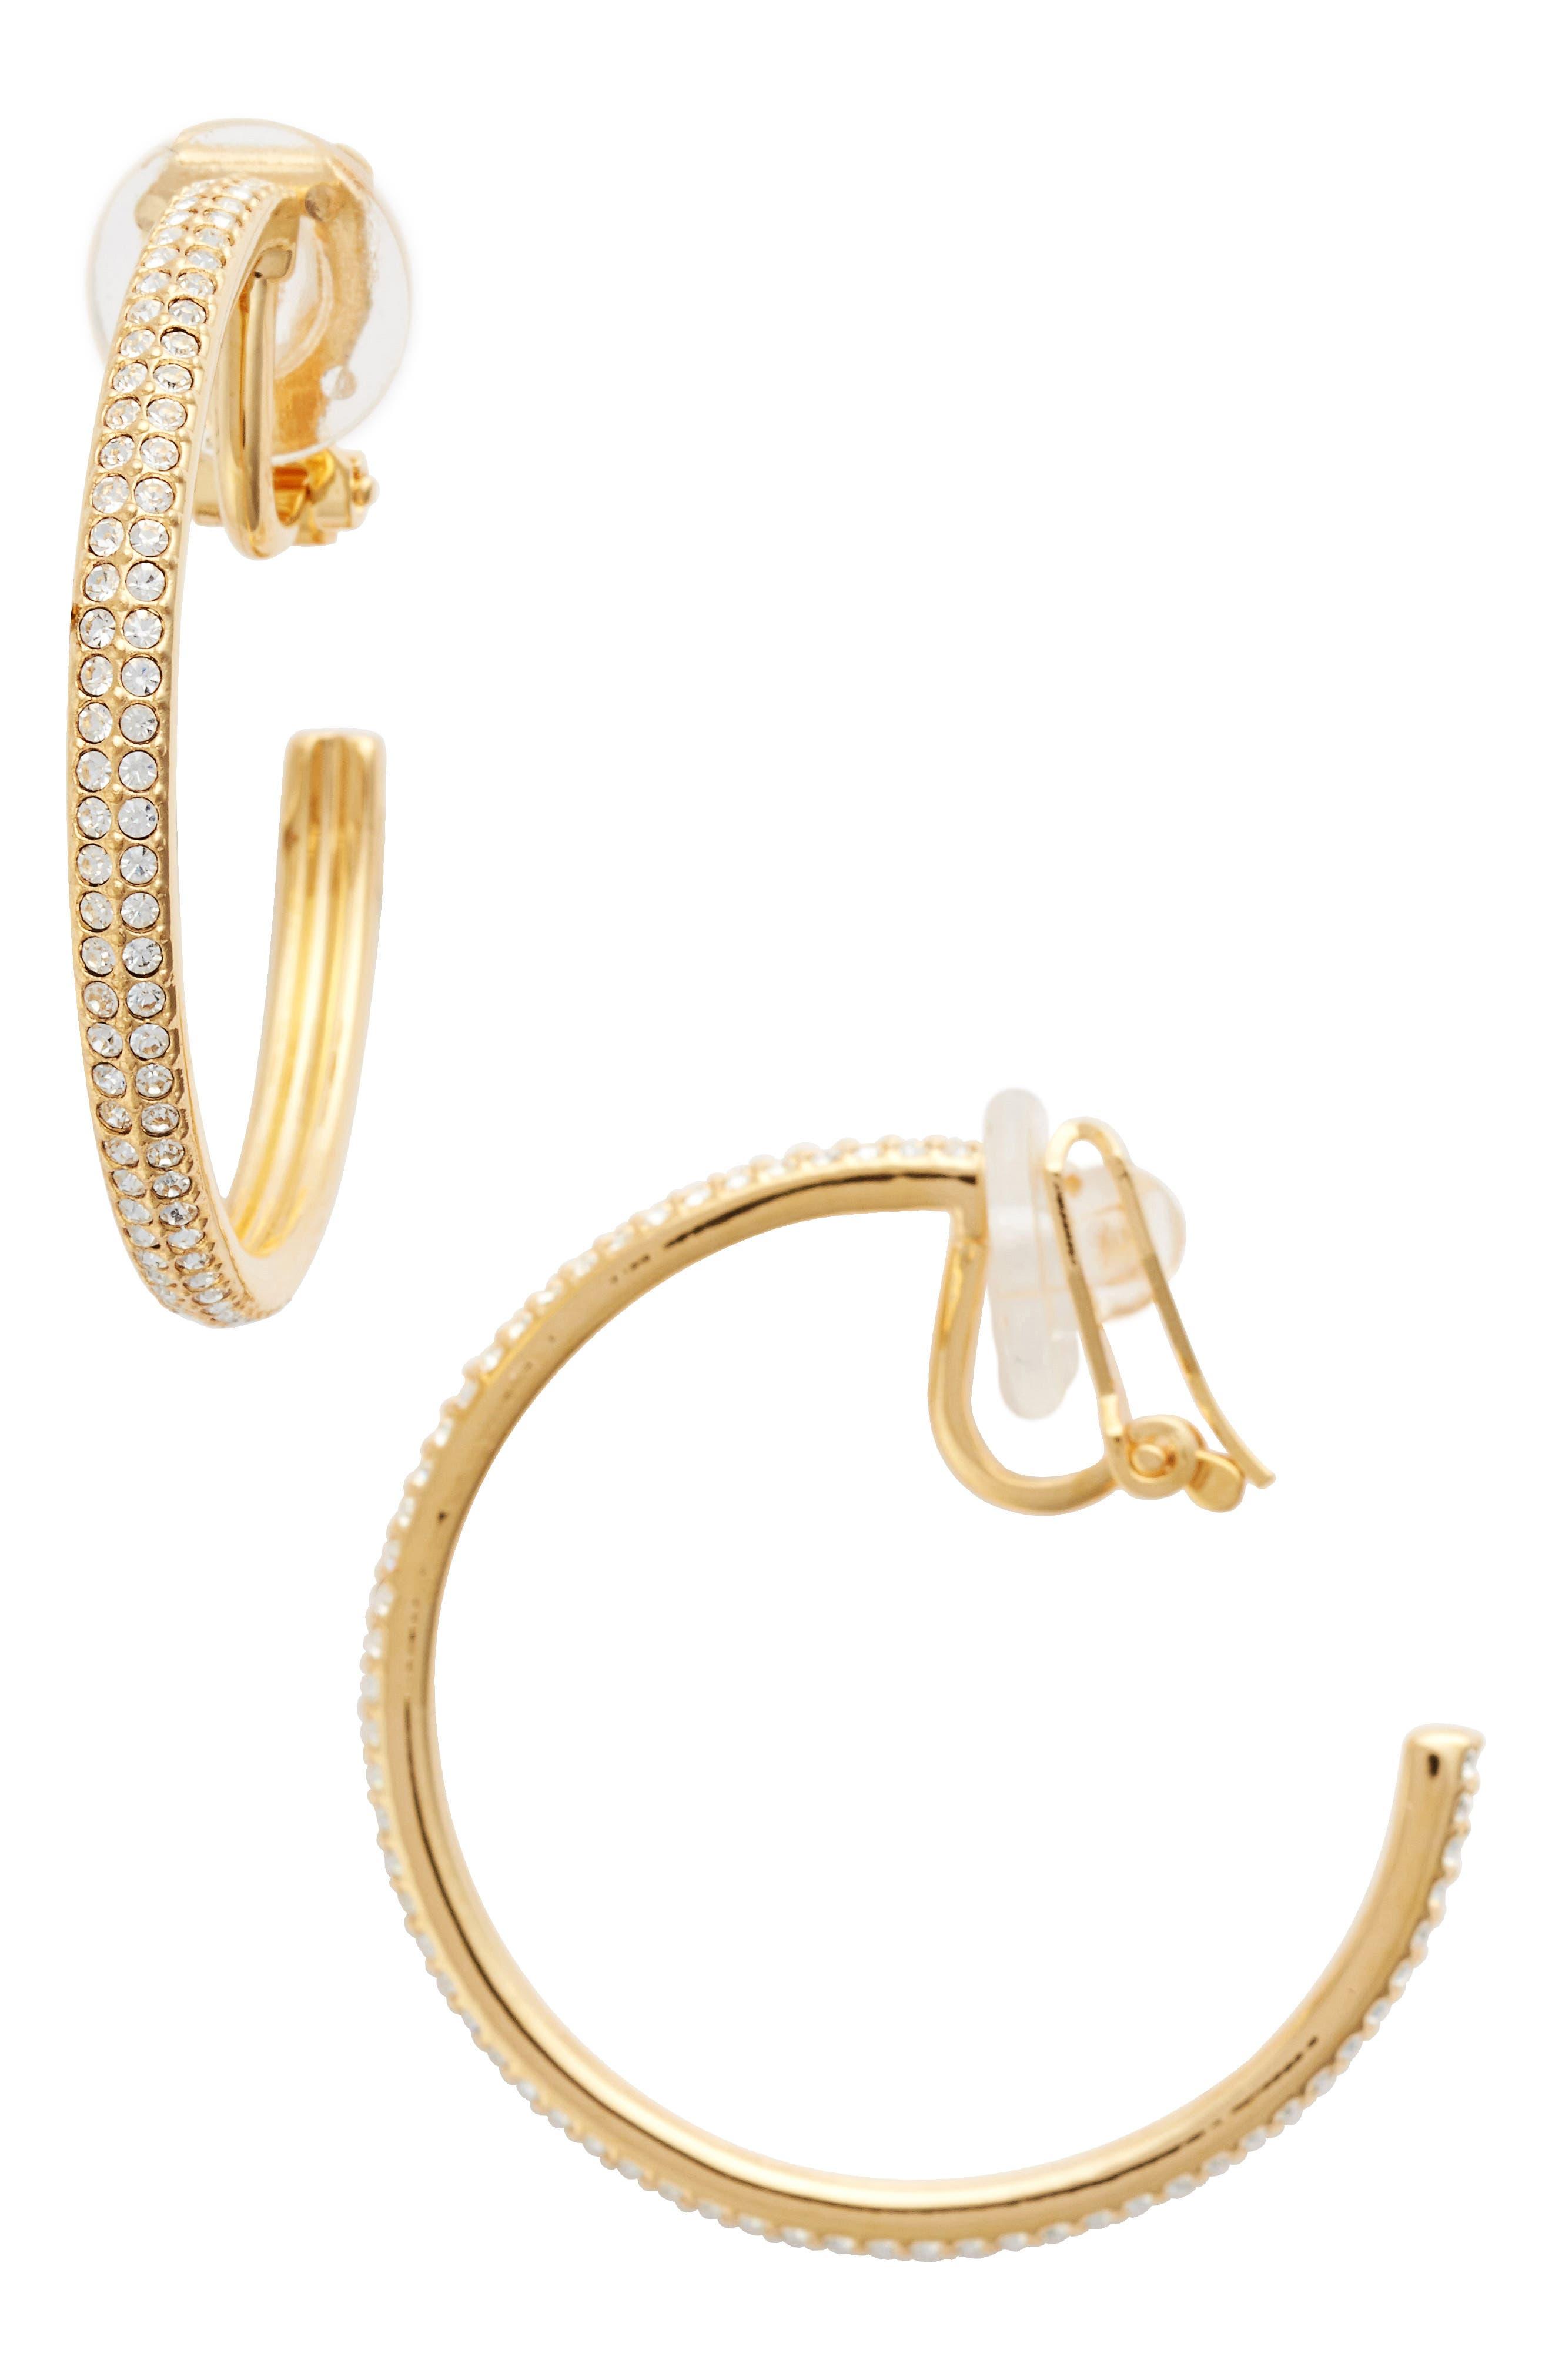 Clip-On Hoop Earrings,                             Main thumbnail 1, color,                             Gold